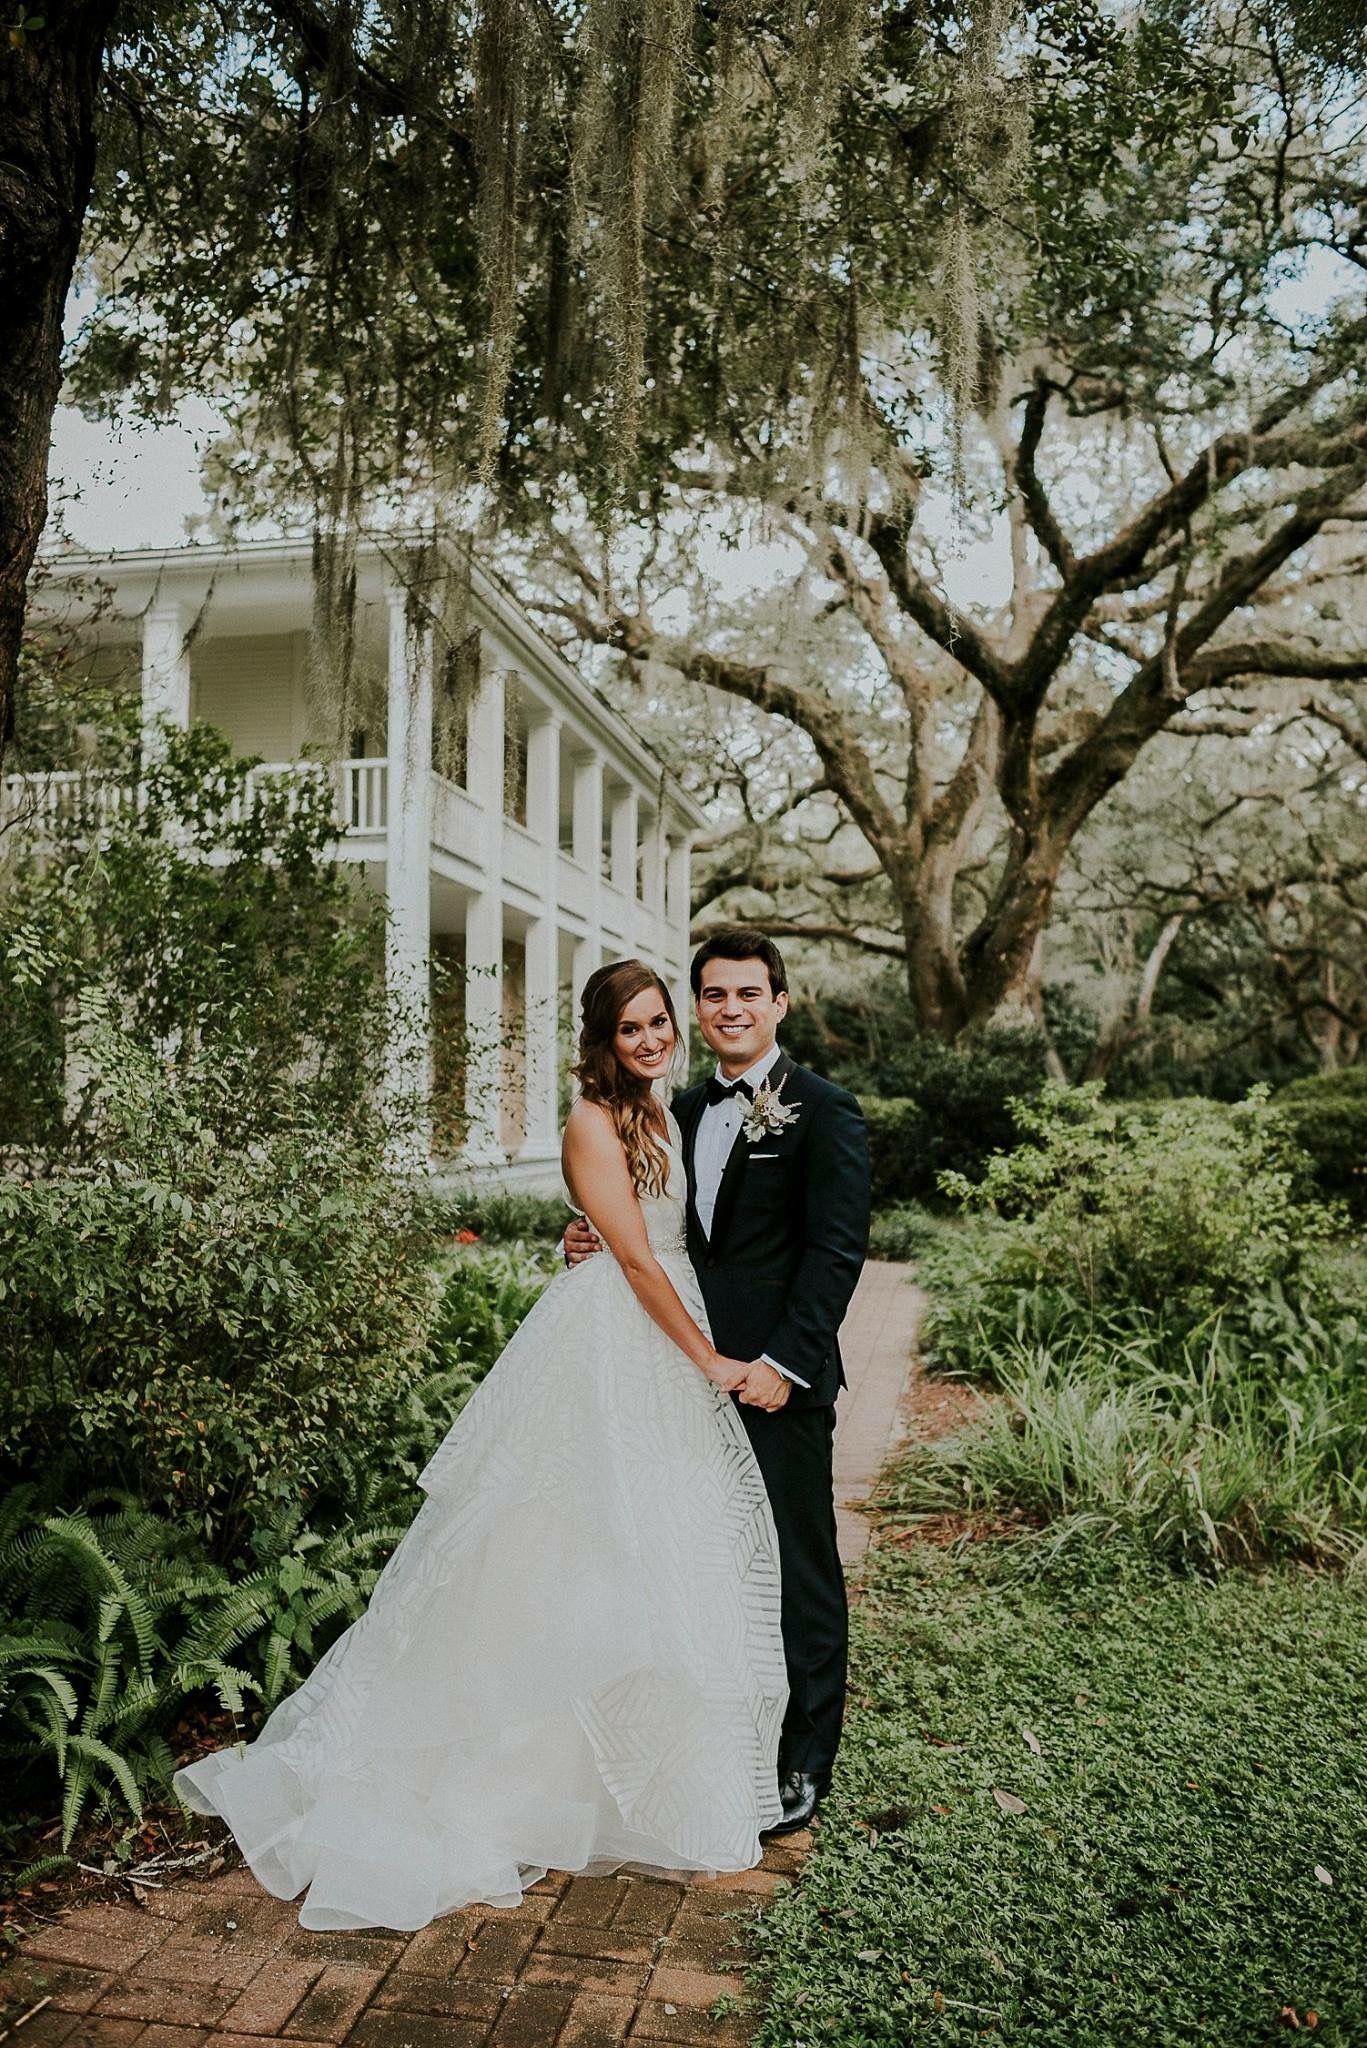 Eden Gardens State Park Wedding Gina and Alex (With